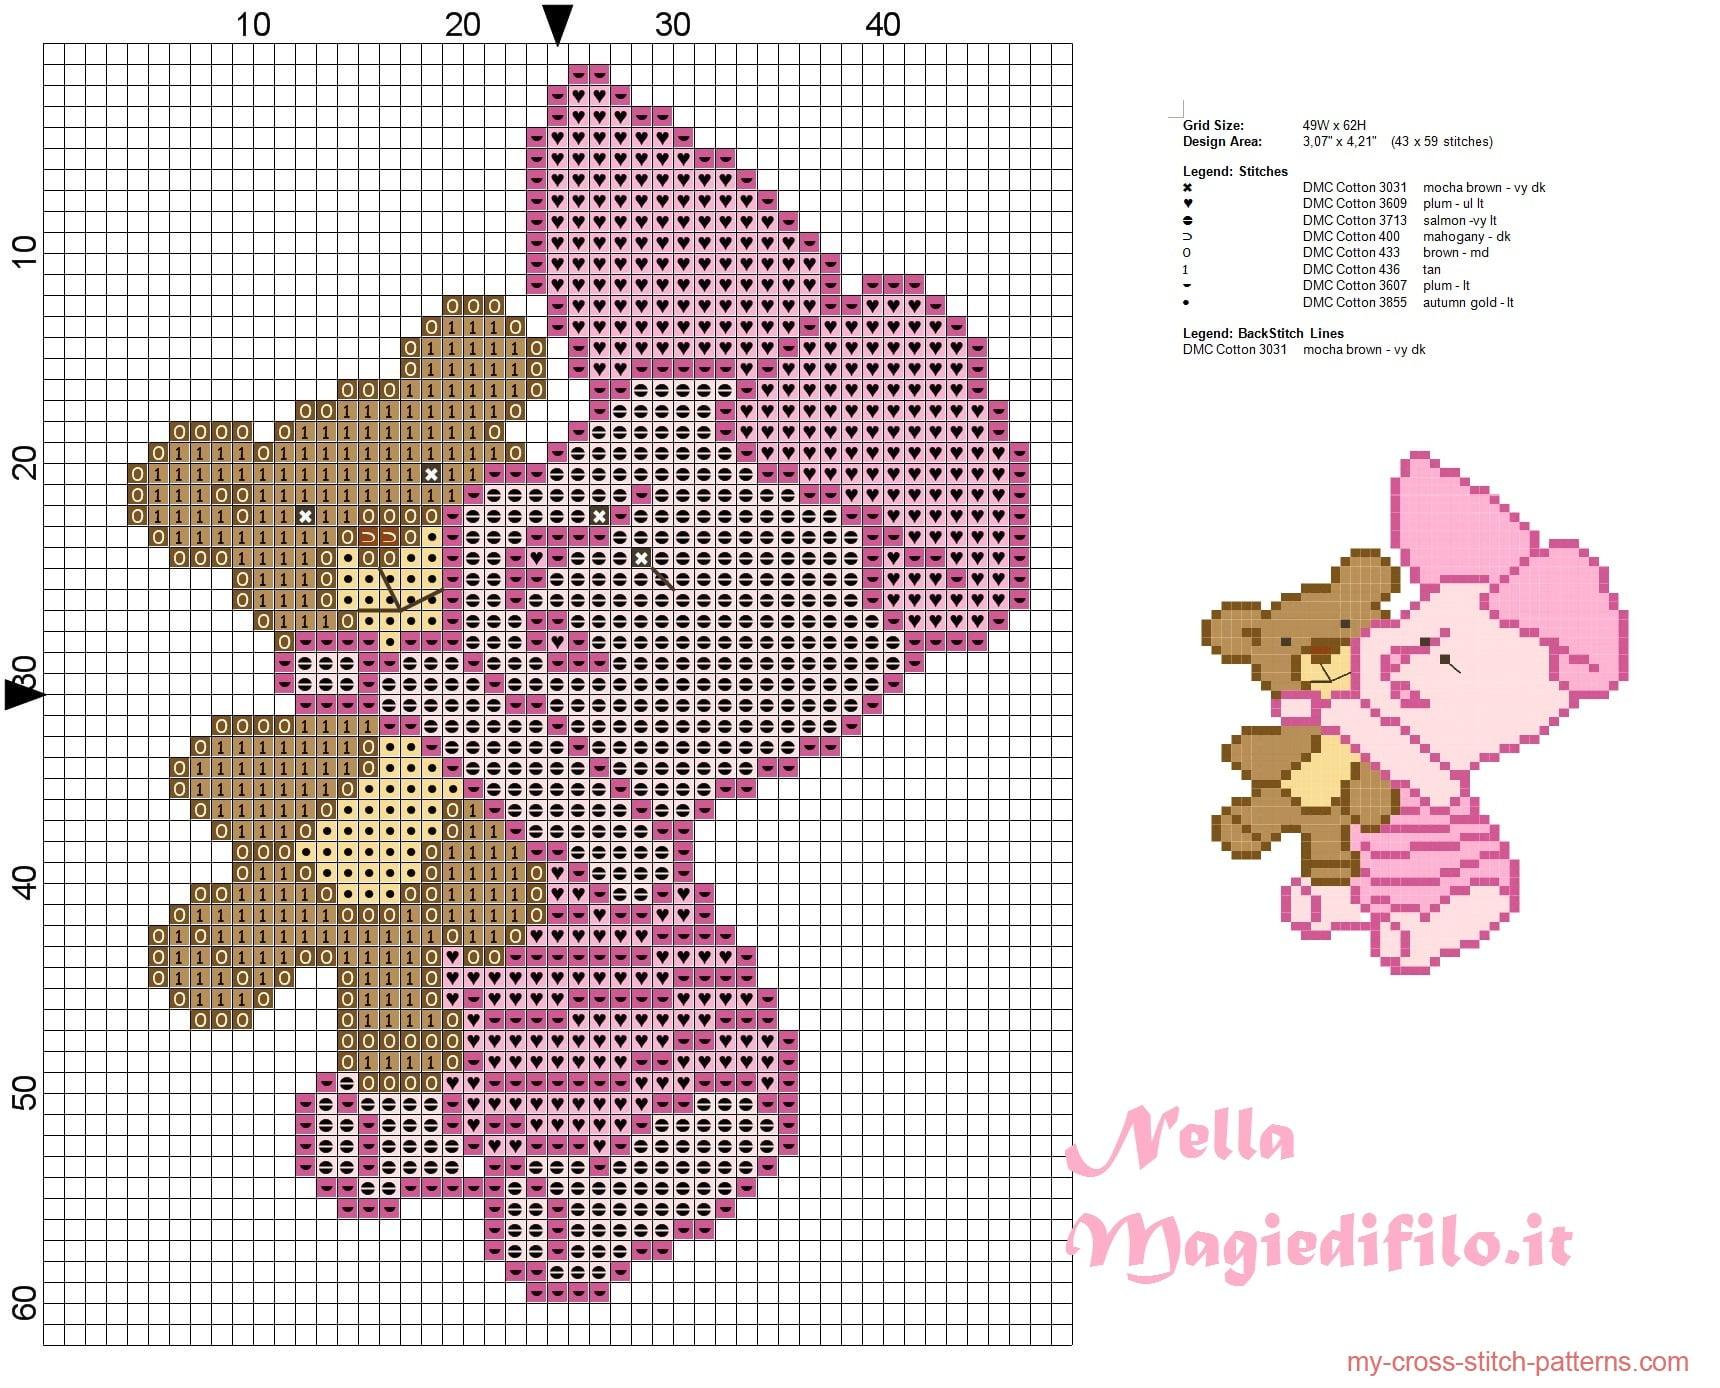 winnie-the-pooh-cross-stitch-patterns